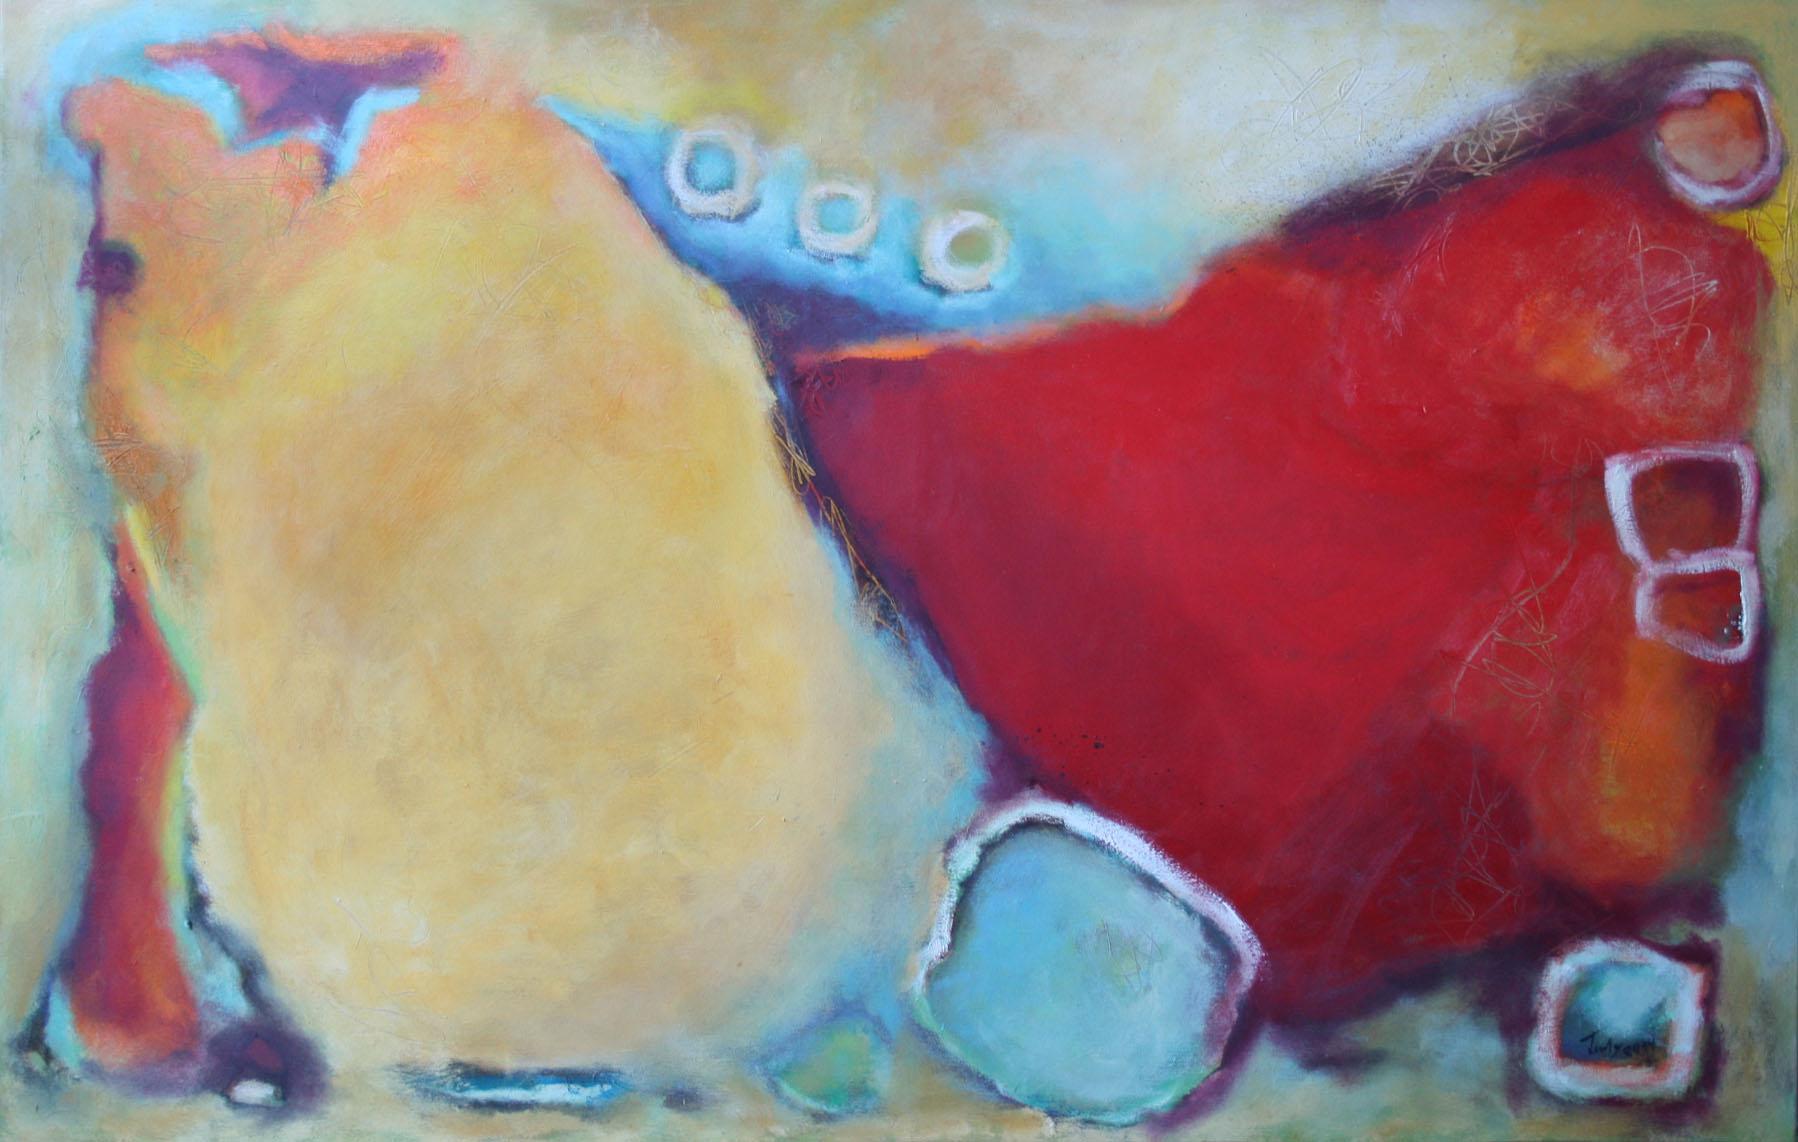 Ohne Titel, Öl und Acryl auf Leinwand, 90 x 140 cm